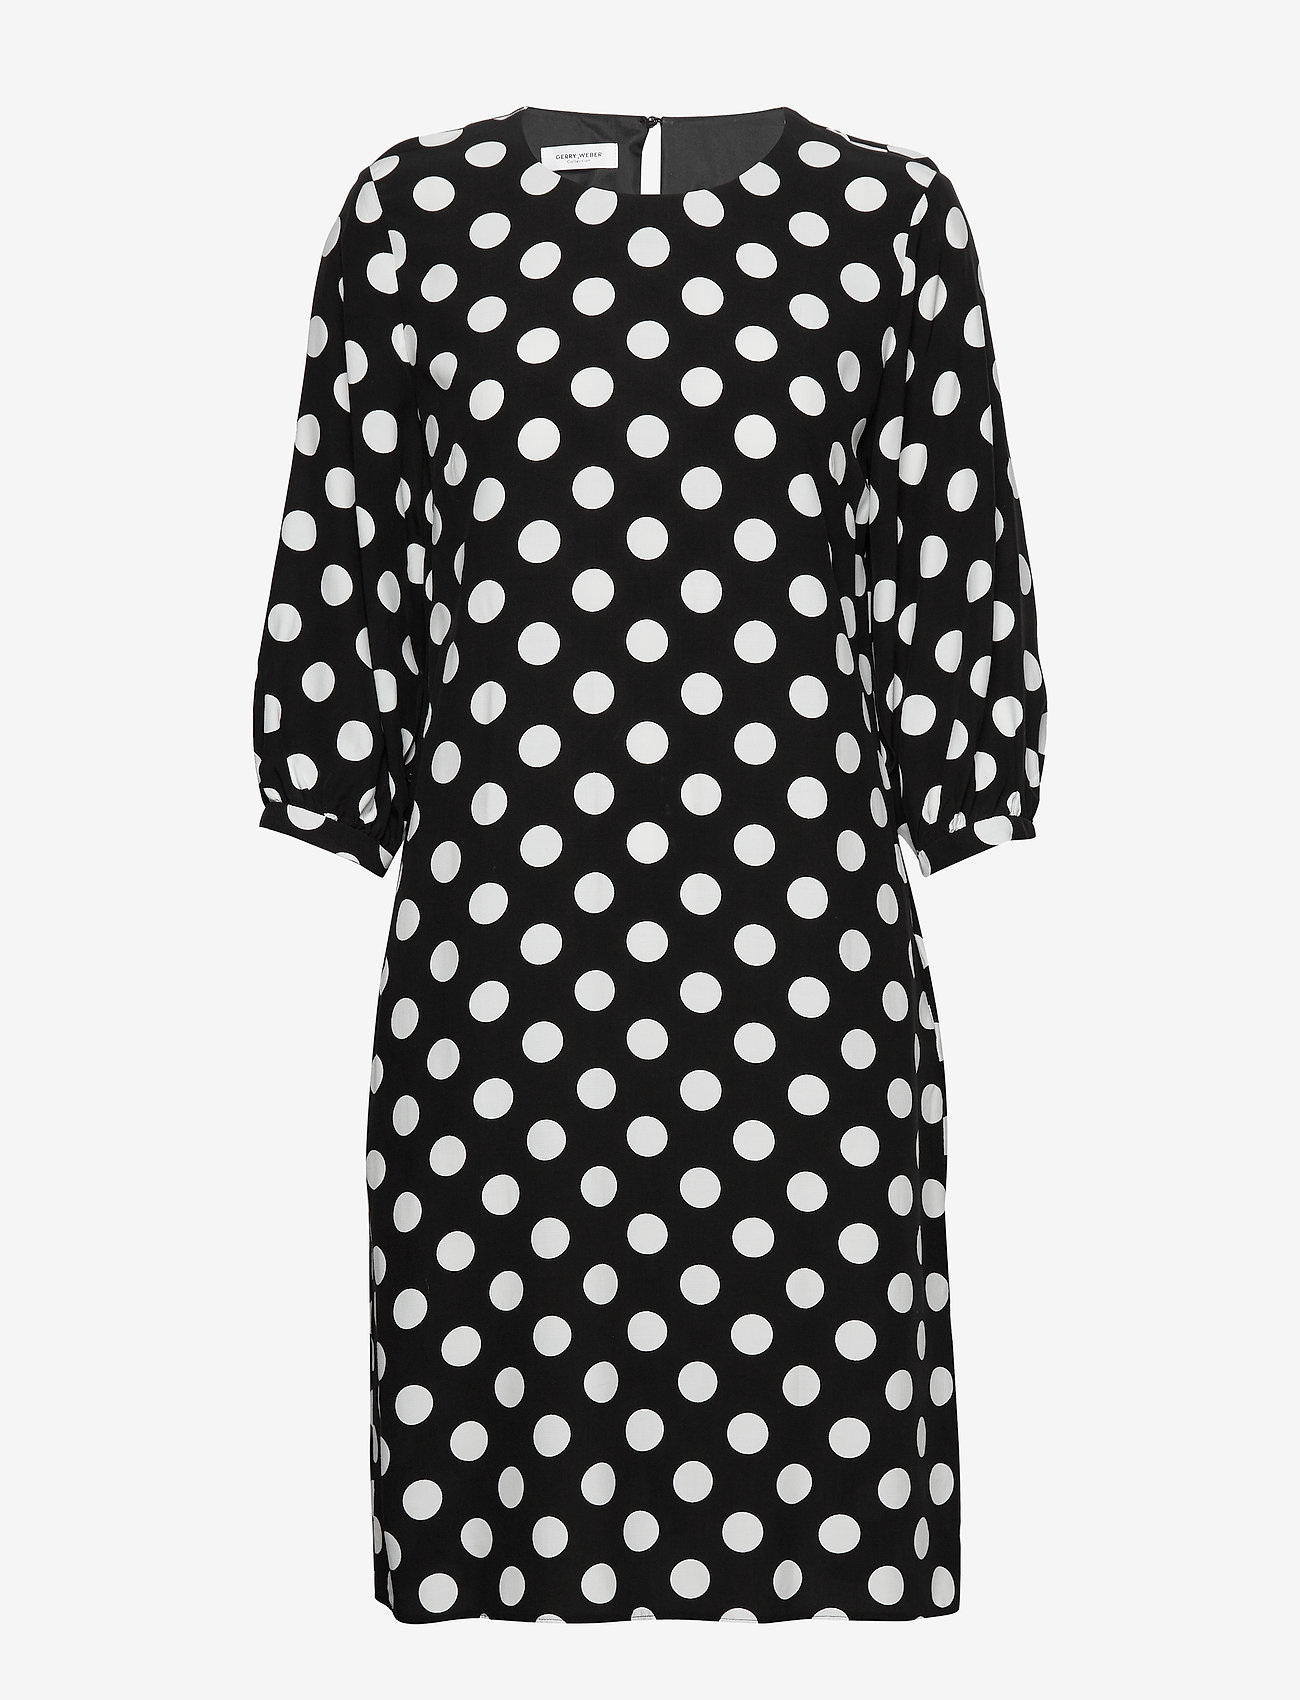 Dress Woven Fabric (Black/ecru/white Print) - Gerry Weber RCC0NF